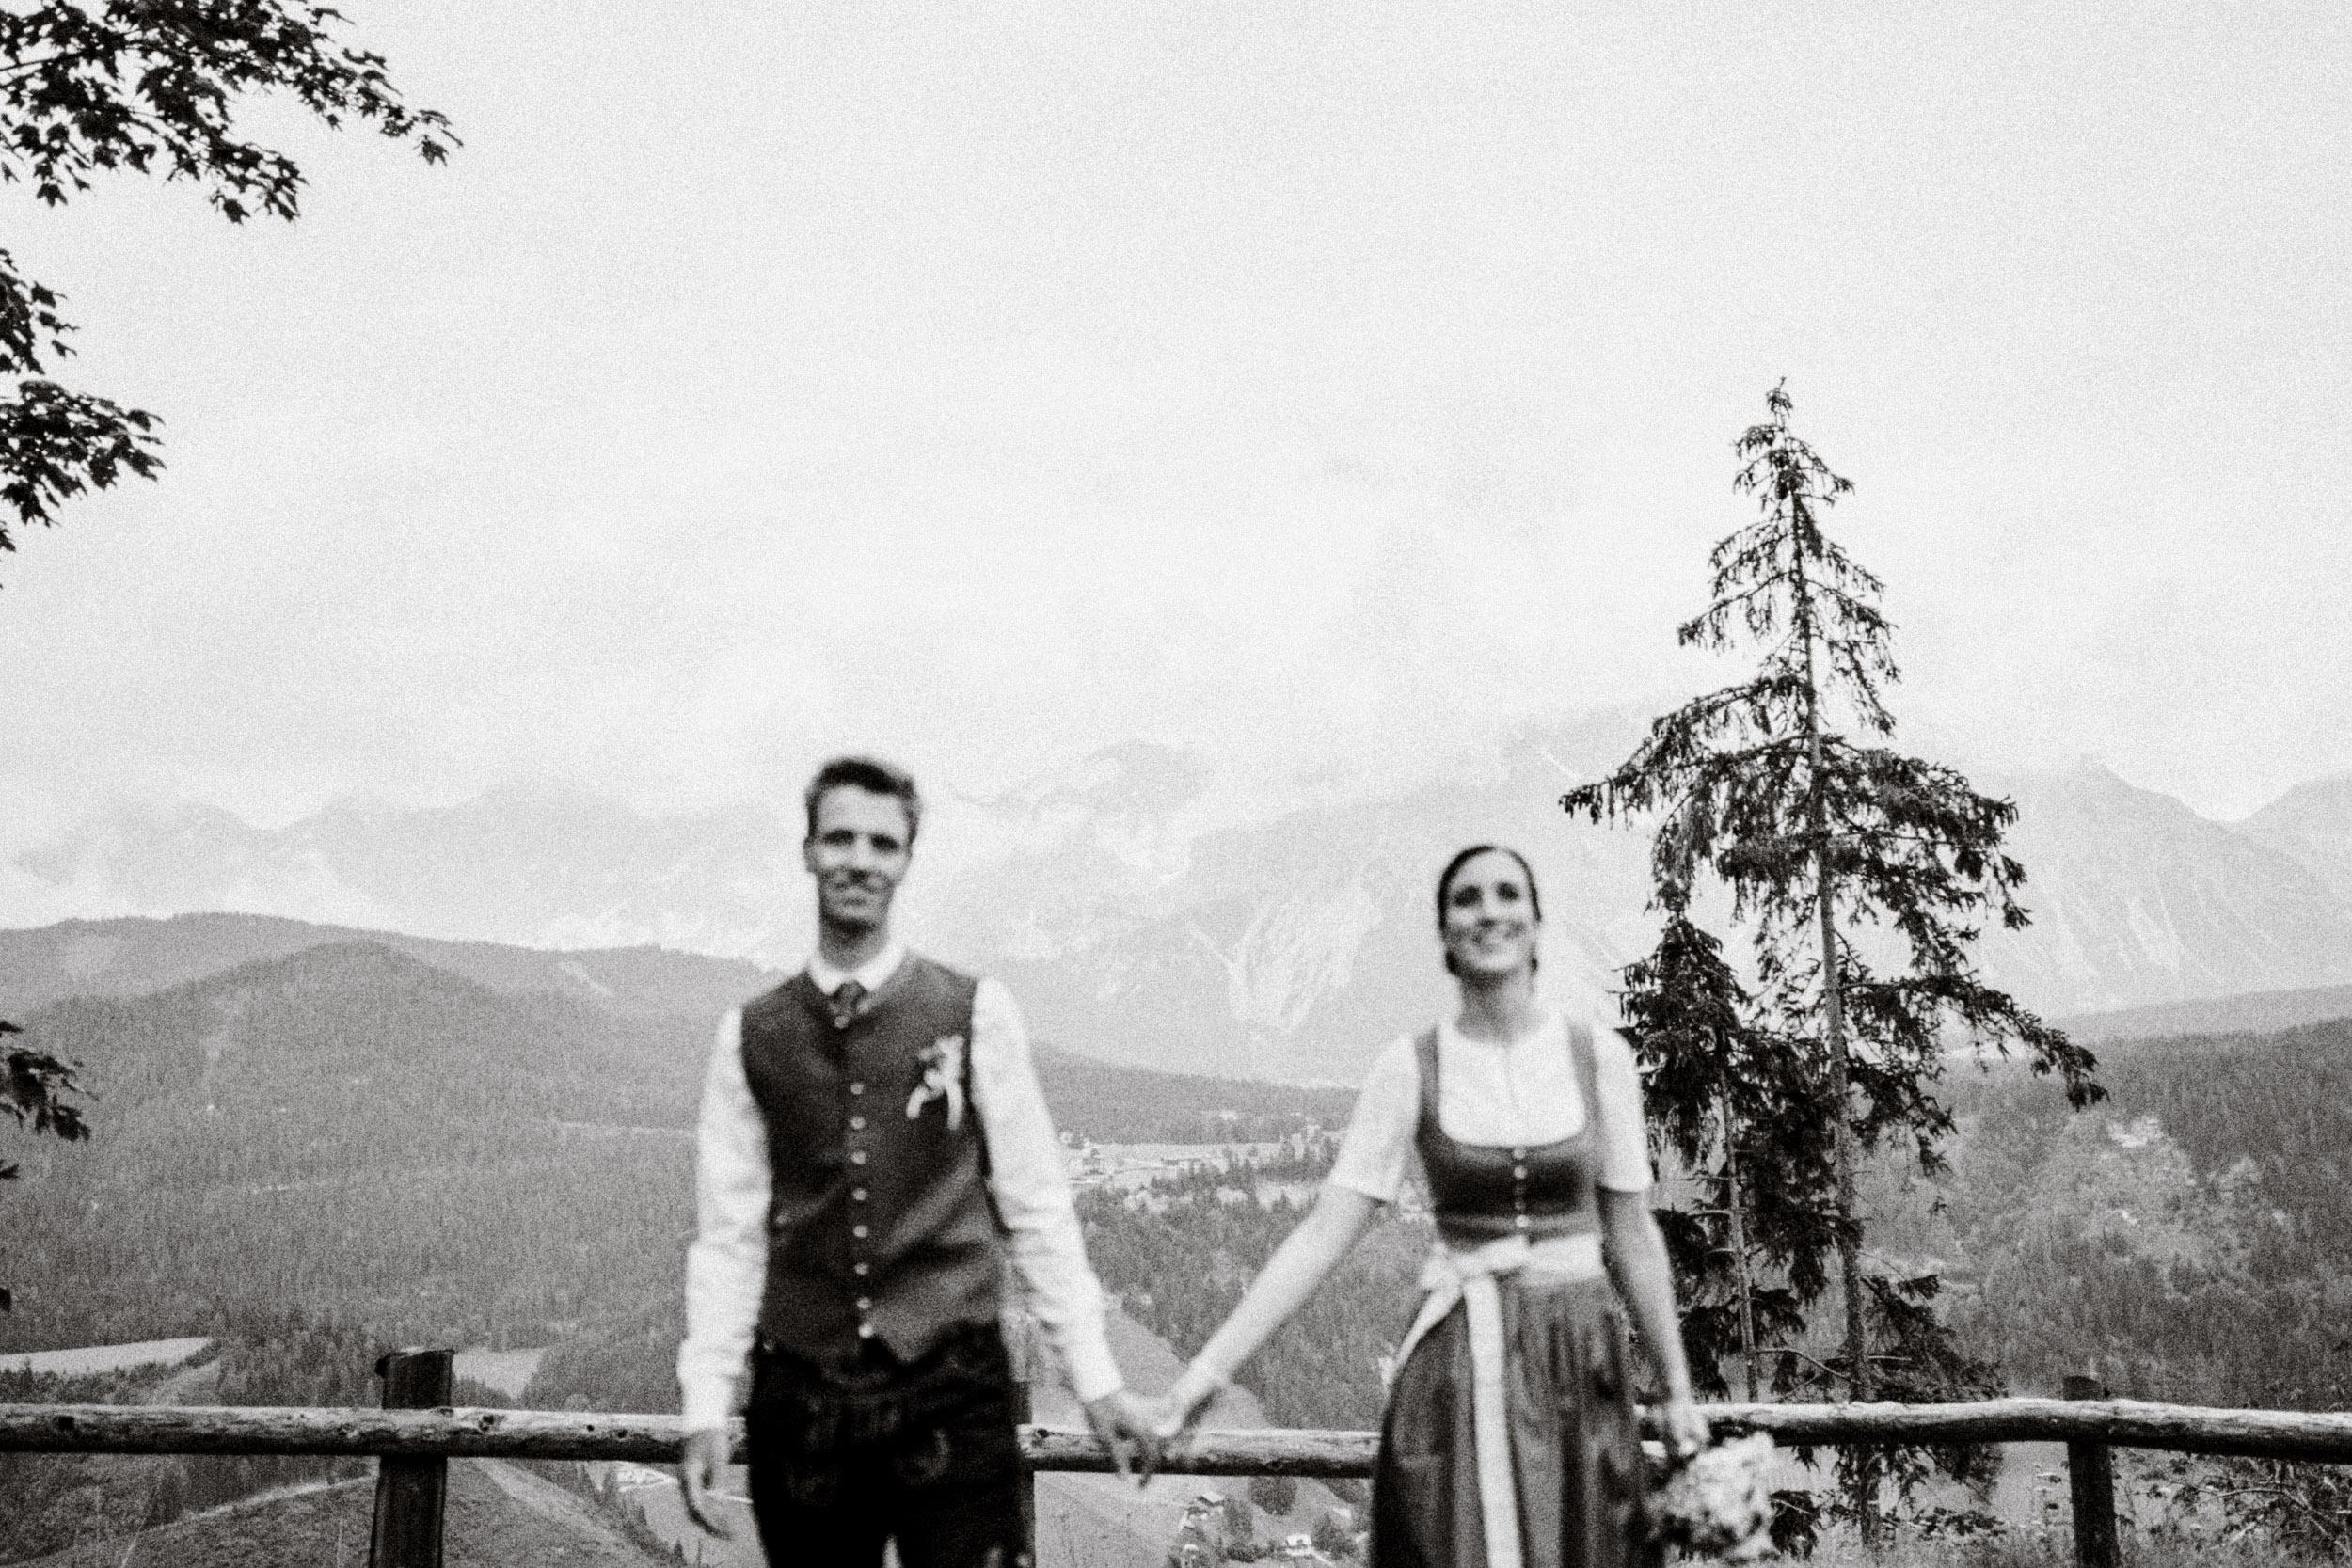 austria_mountain_wedding_photography_countryside_vienna-18.jpg